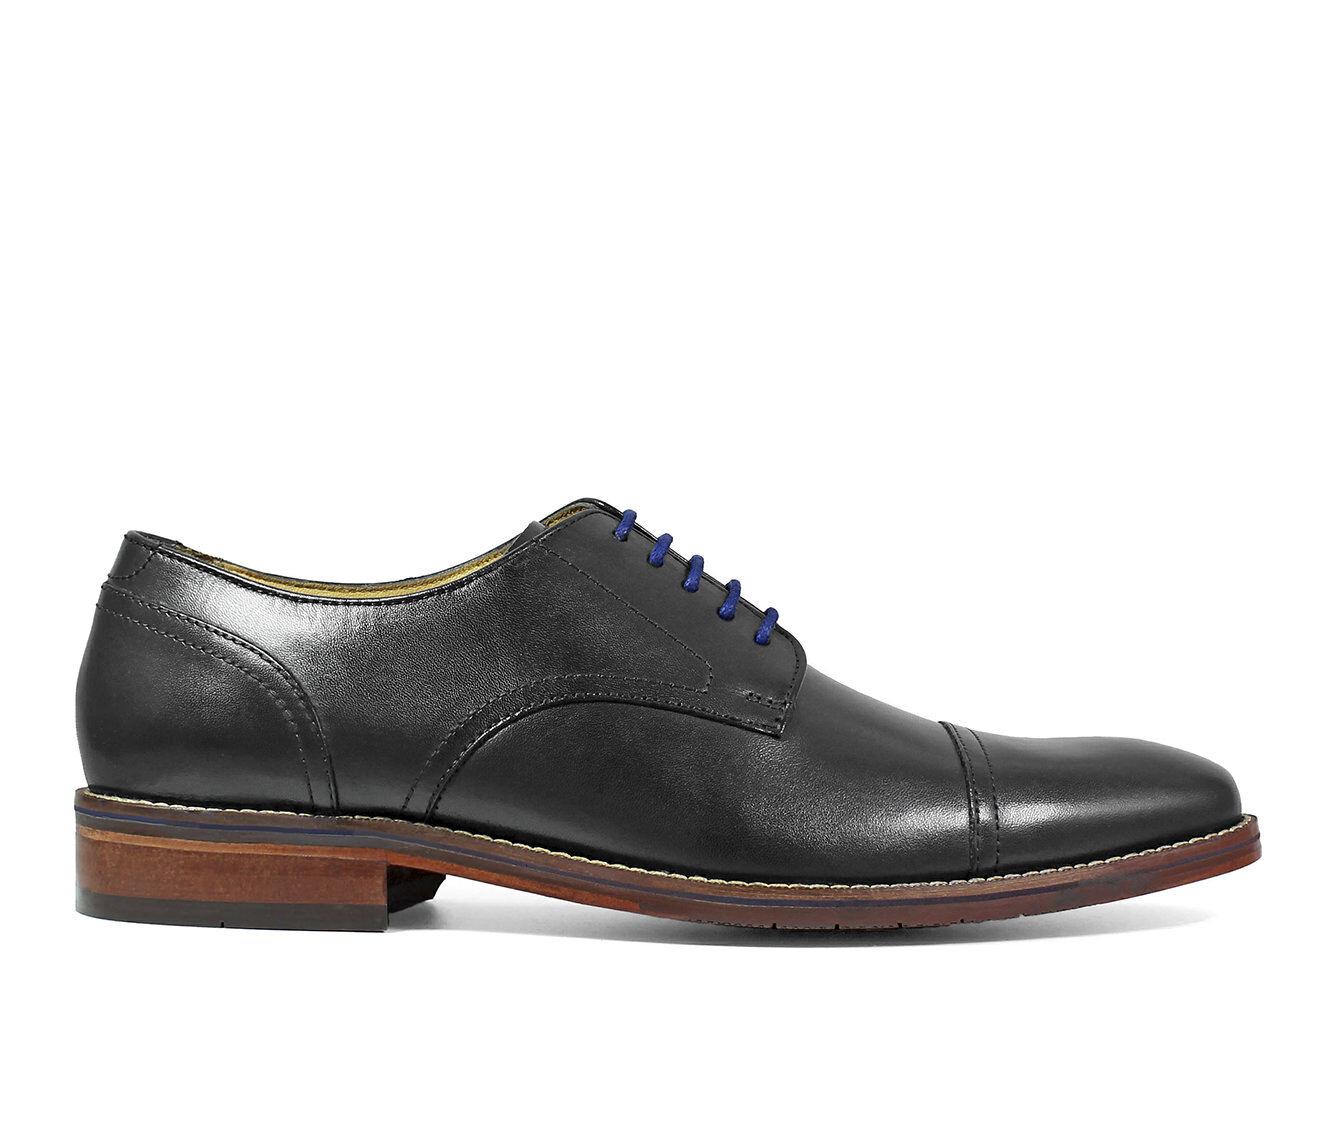 Men's Florsheim Salerno Cap Toe Oxford Dress Shoes Black